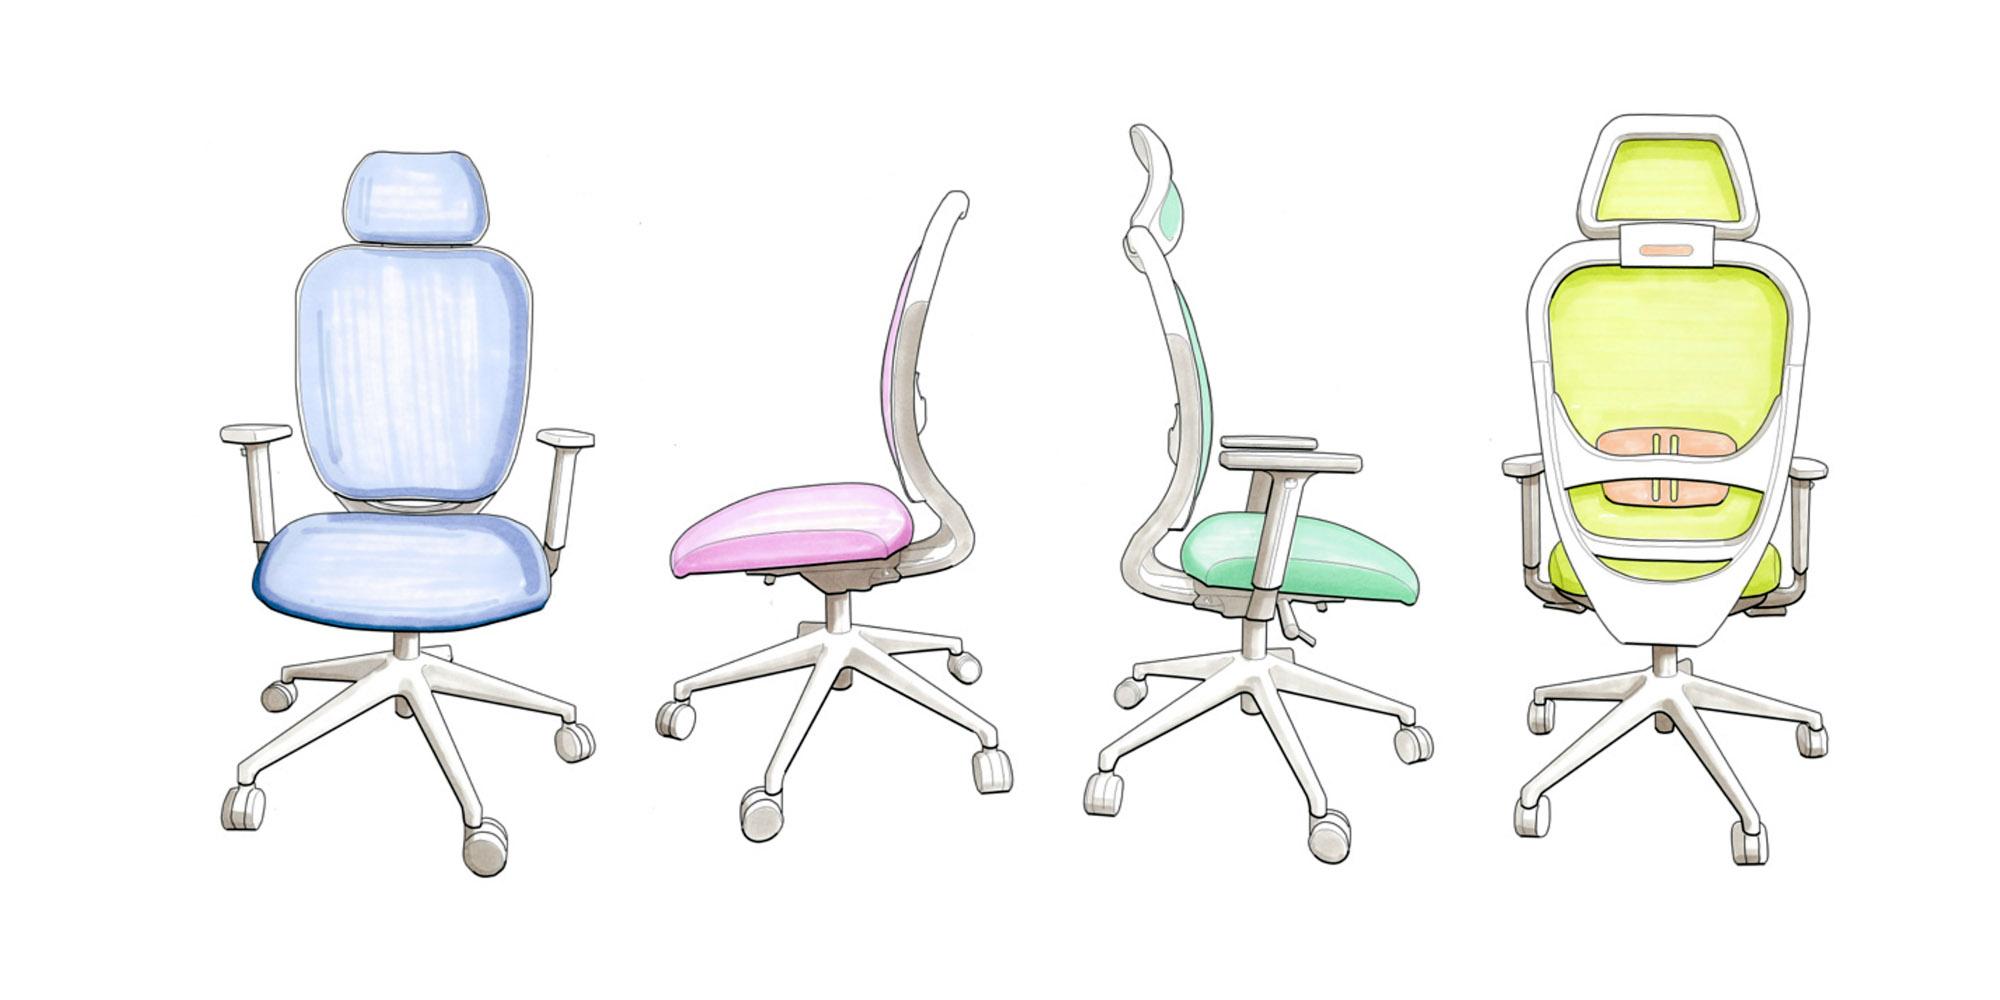 Jones-and-Partners-Oscar-office-chair-sketchs.jpg